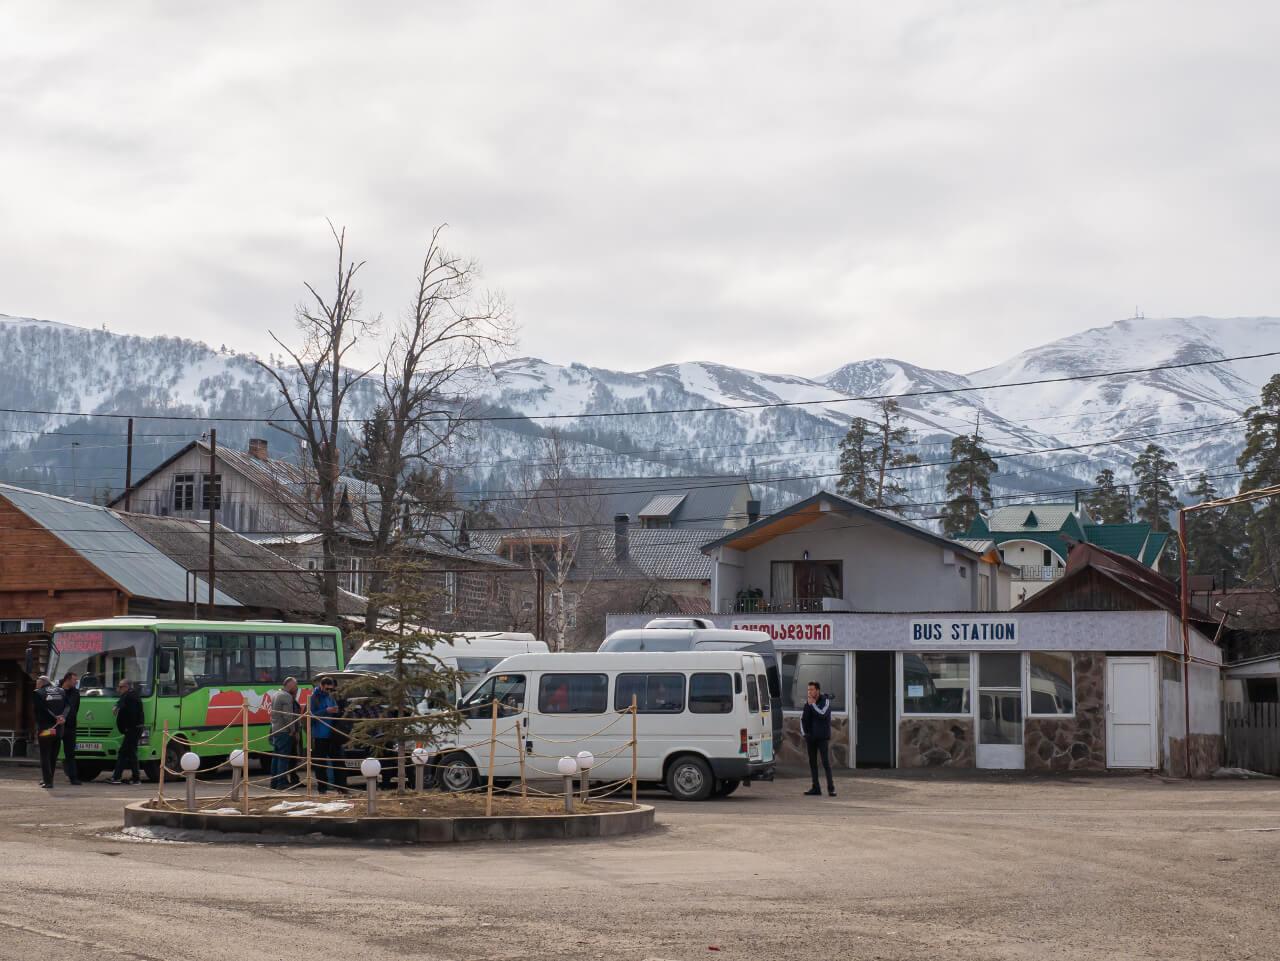 Dworzec marszrutek w Bakurani